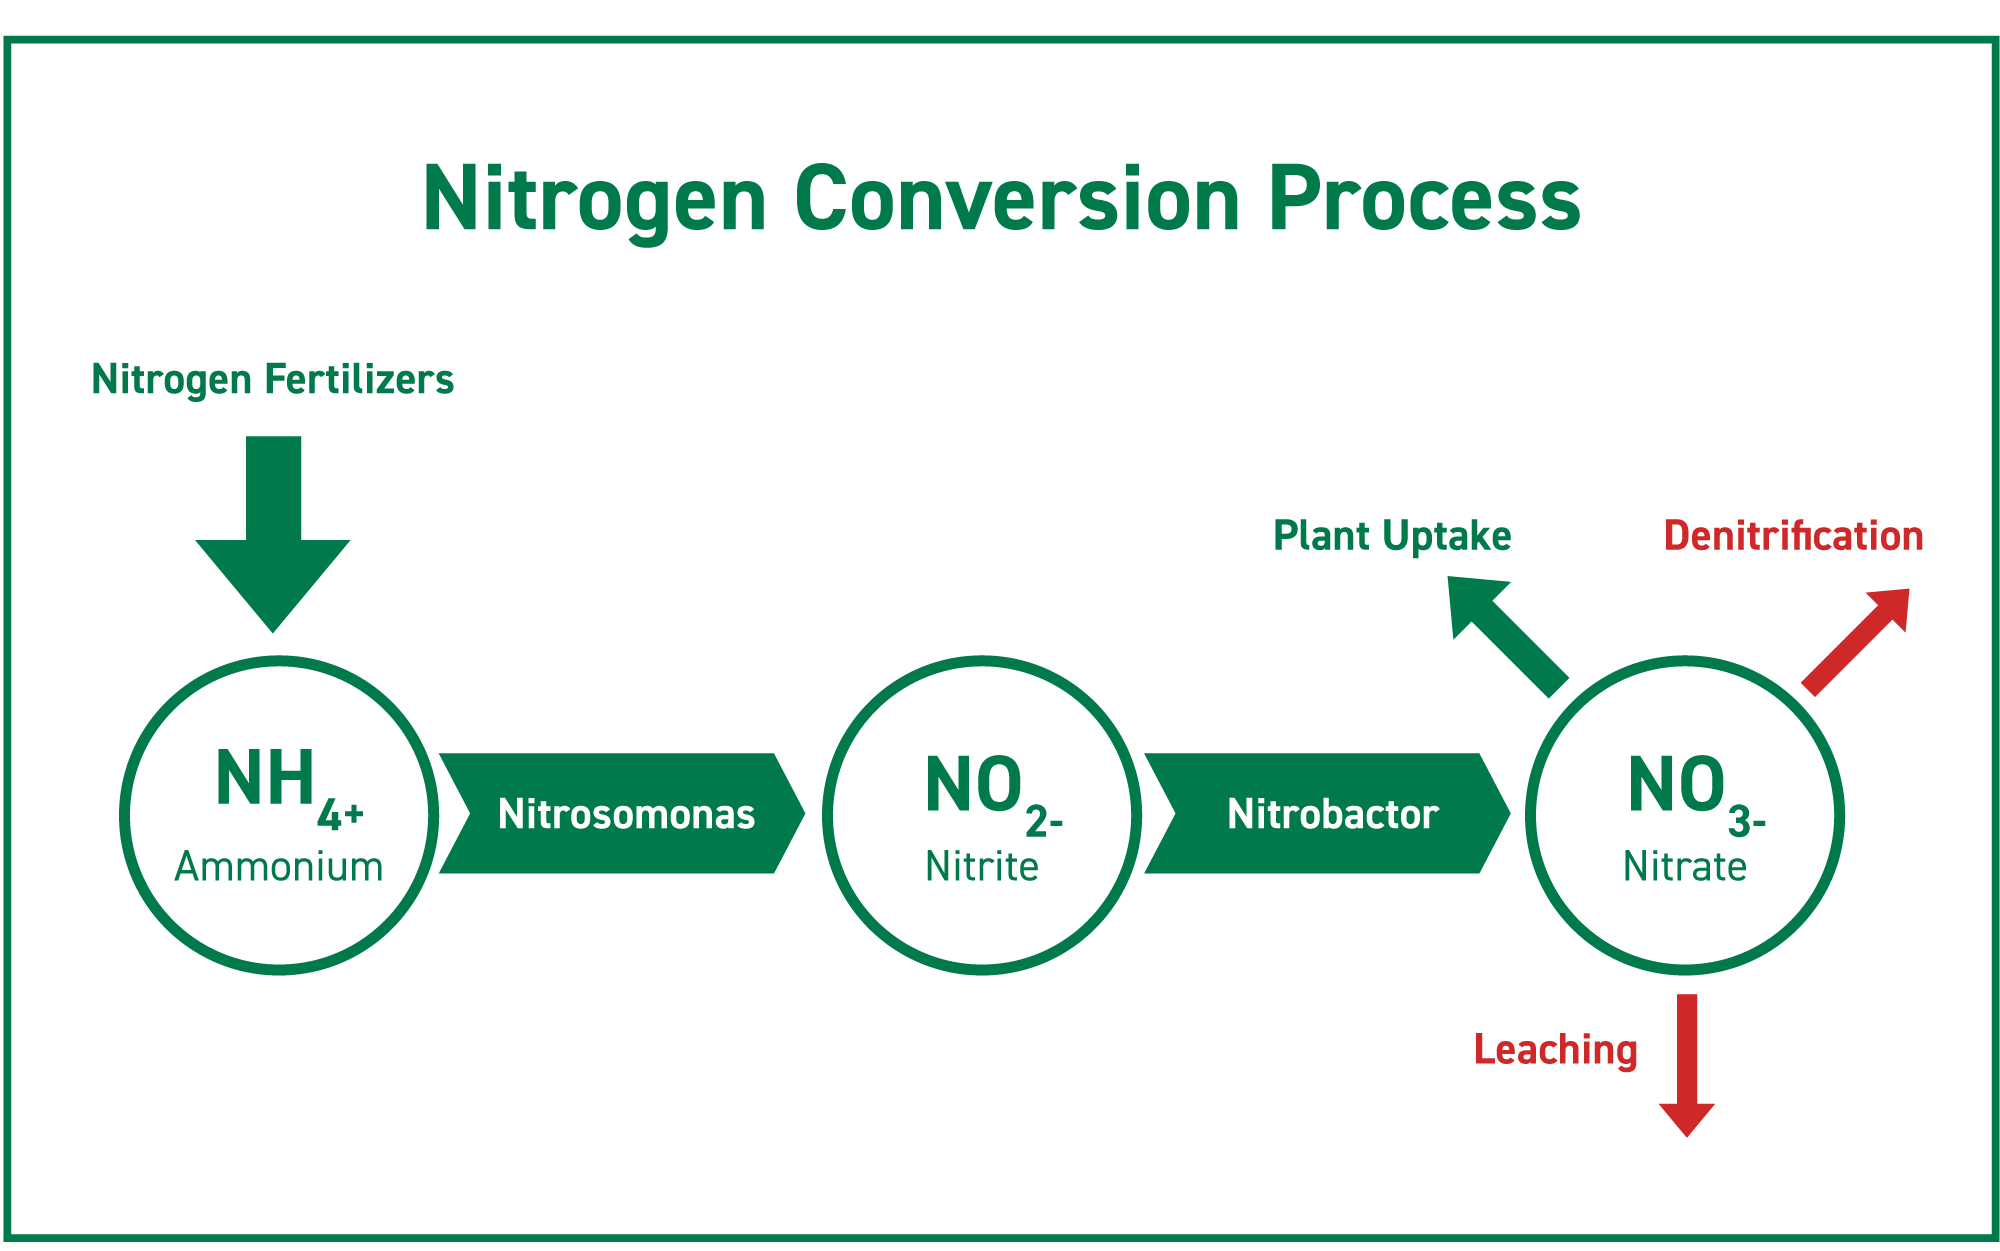 the nitrogen conversion process